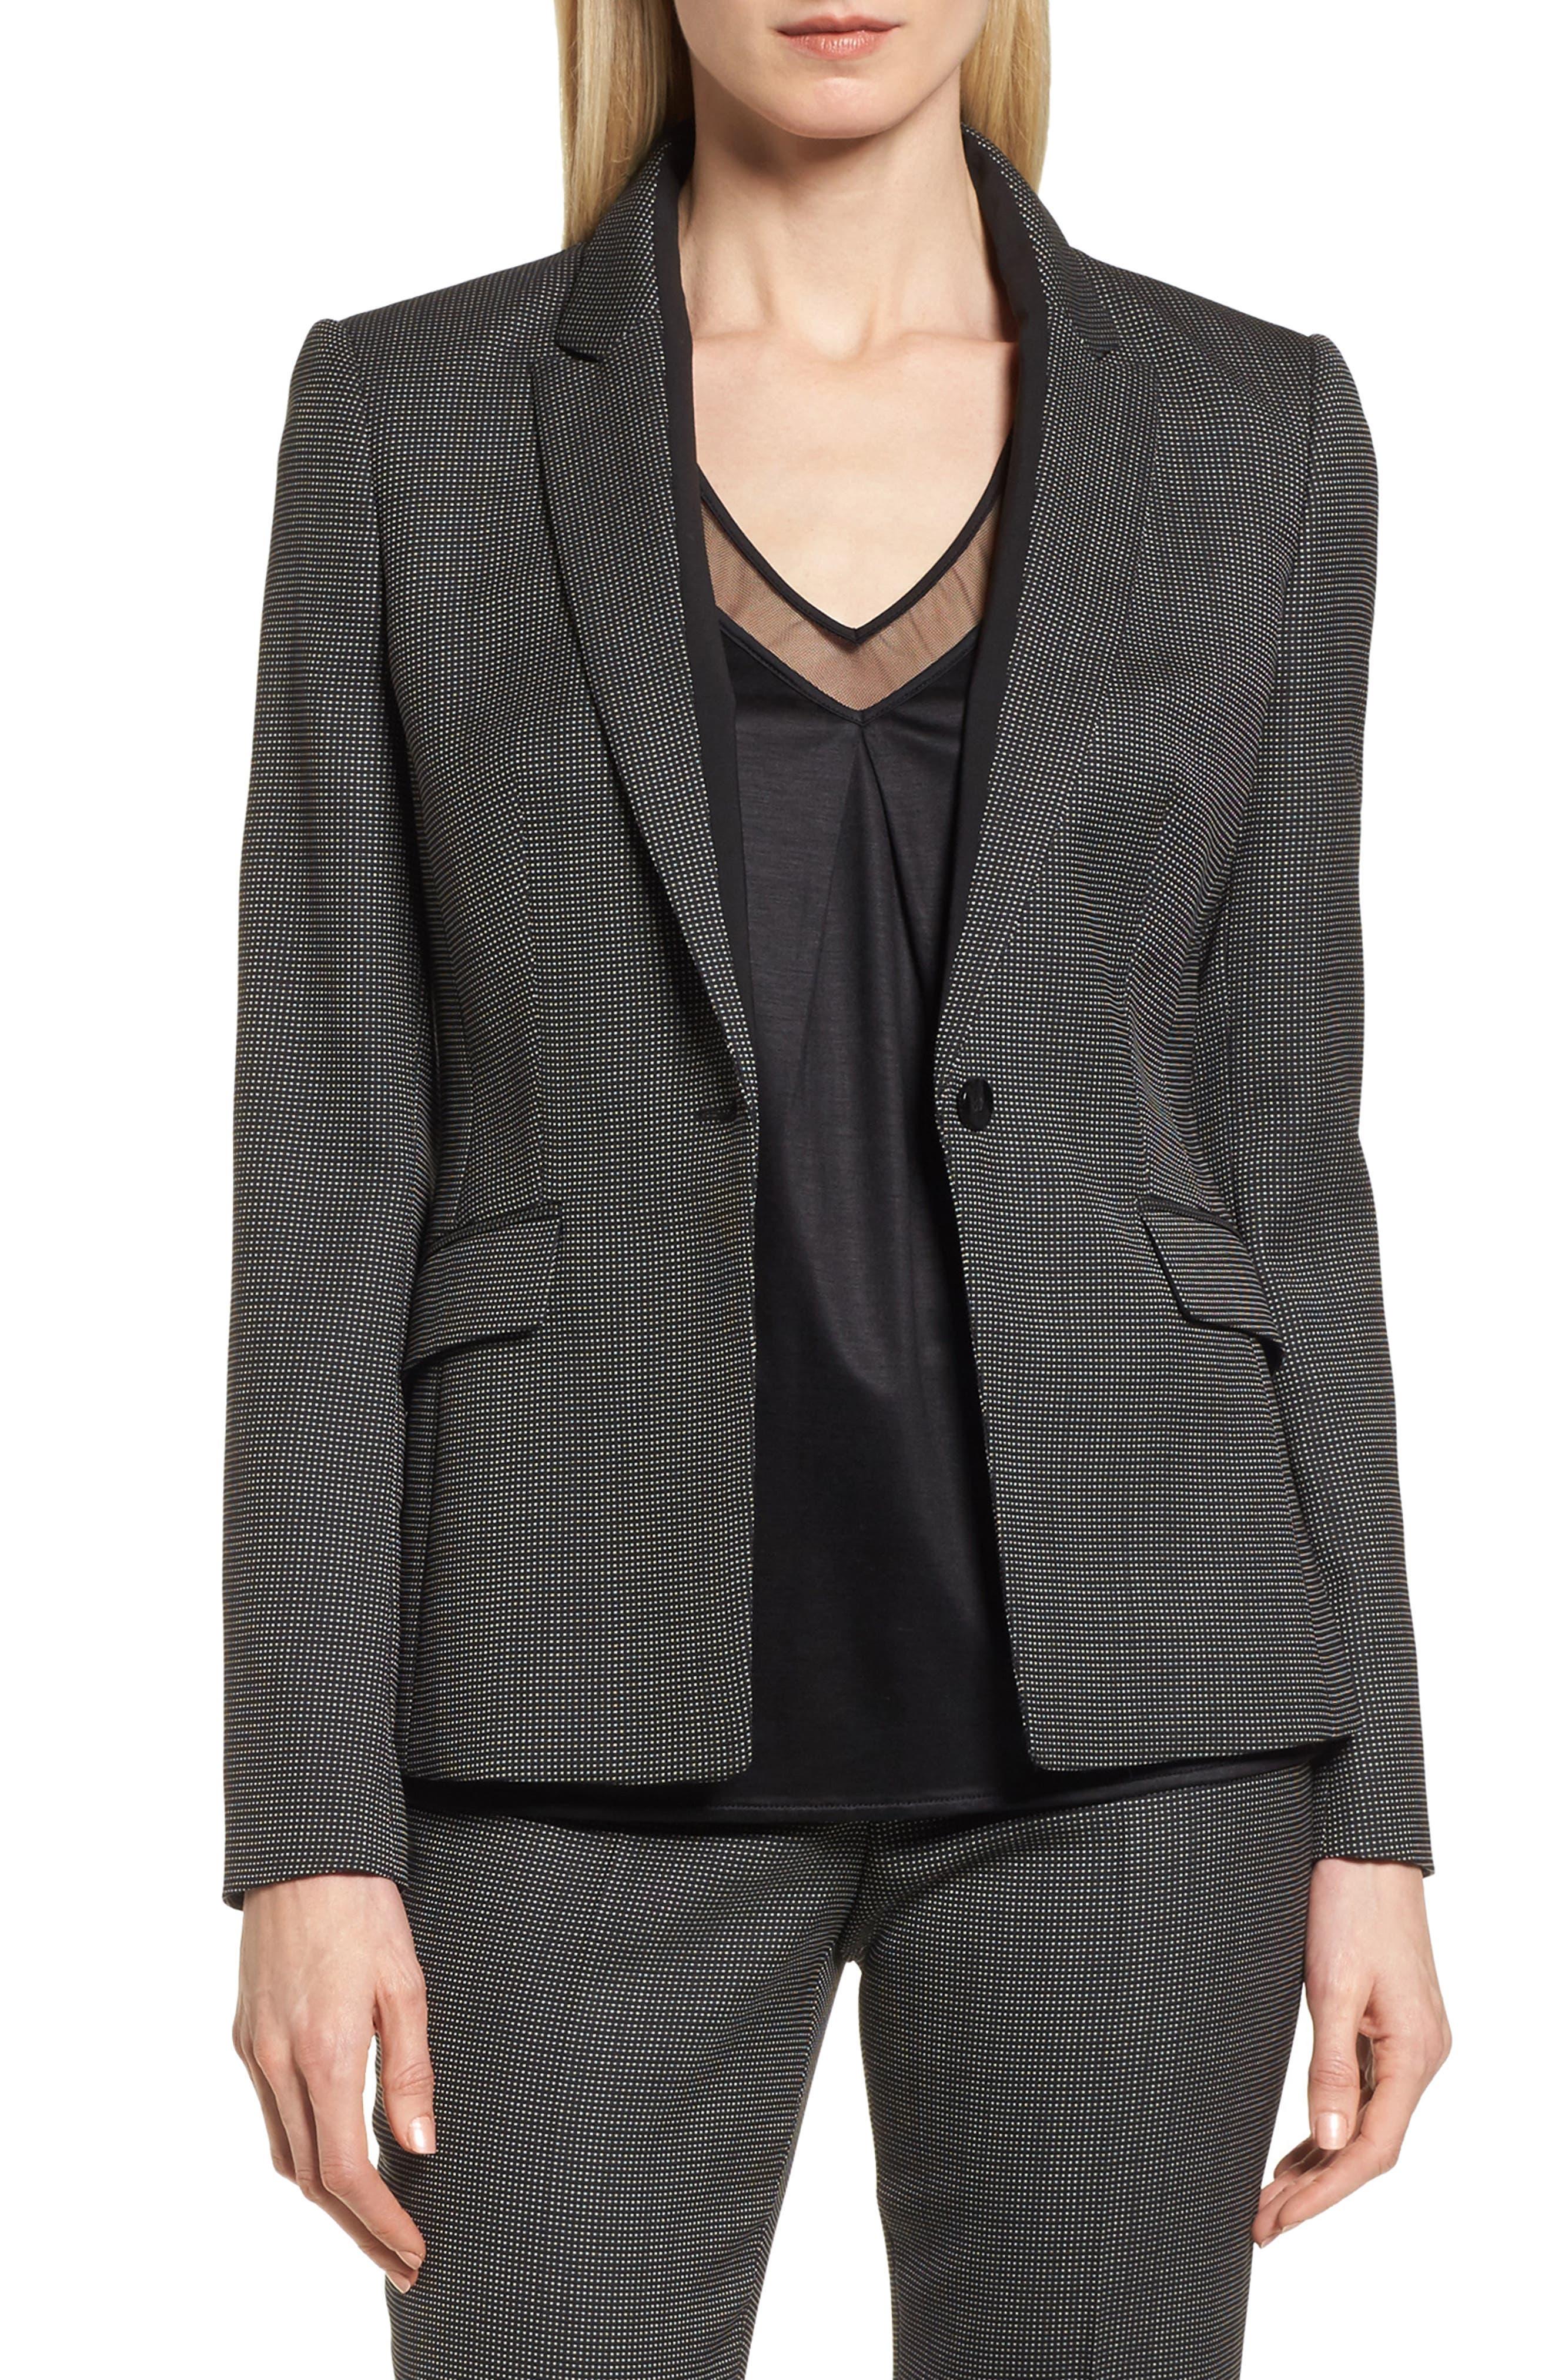 Jeresa Check Stretch Wool Suit Jacket,                             Main thumbnail 1, color,                             Black Fantasy